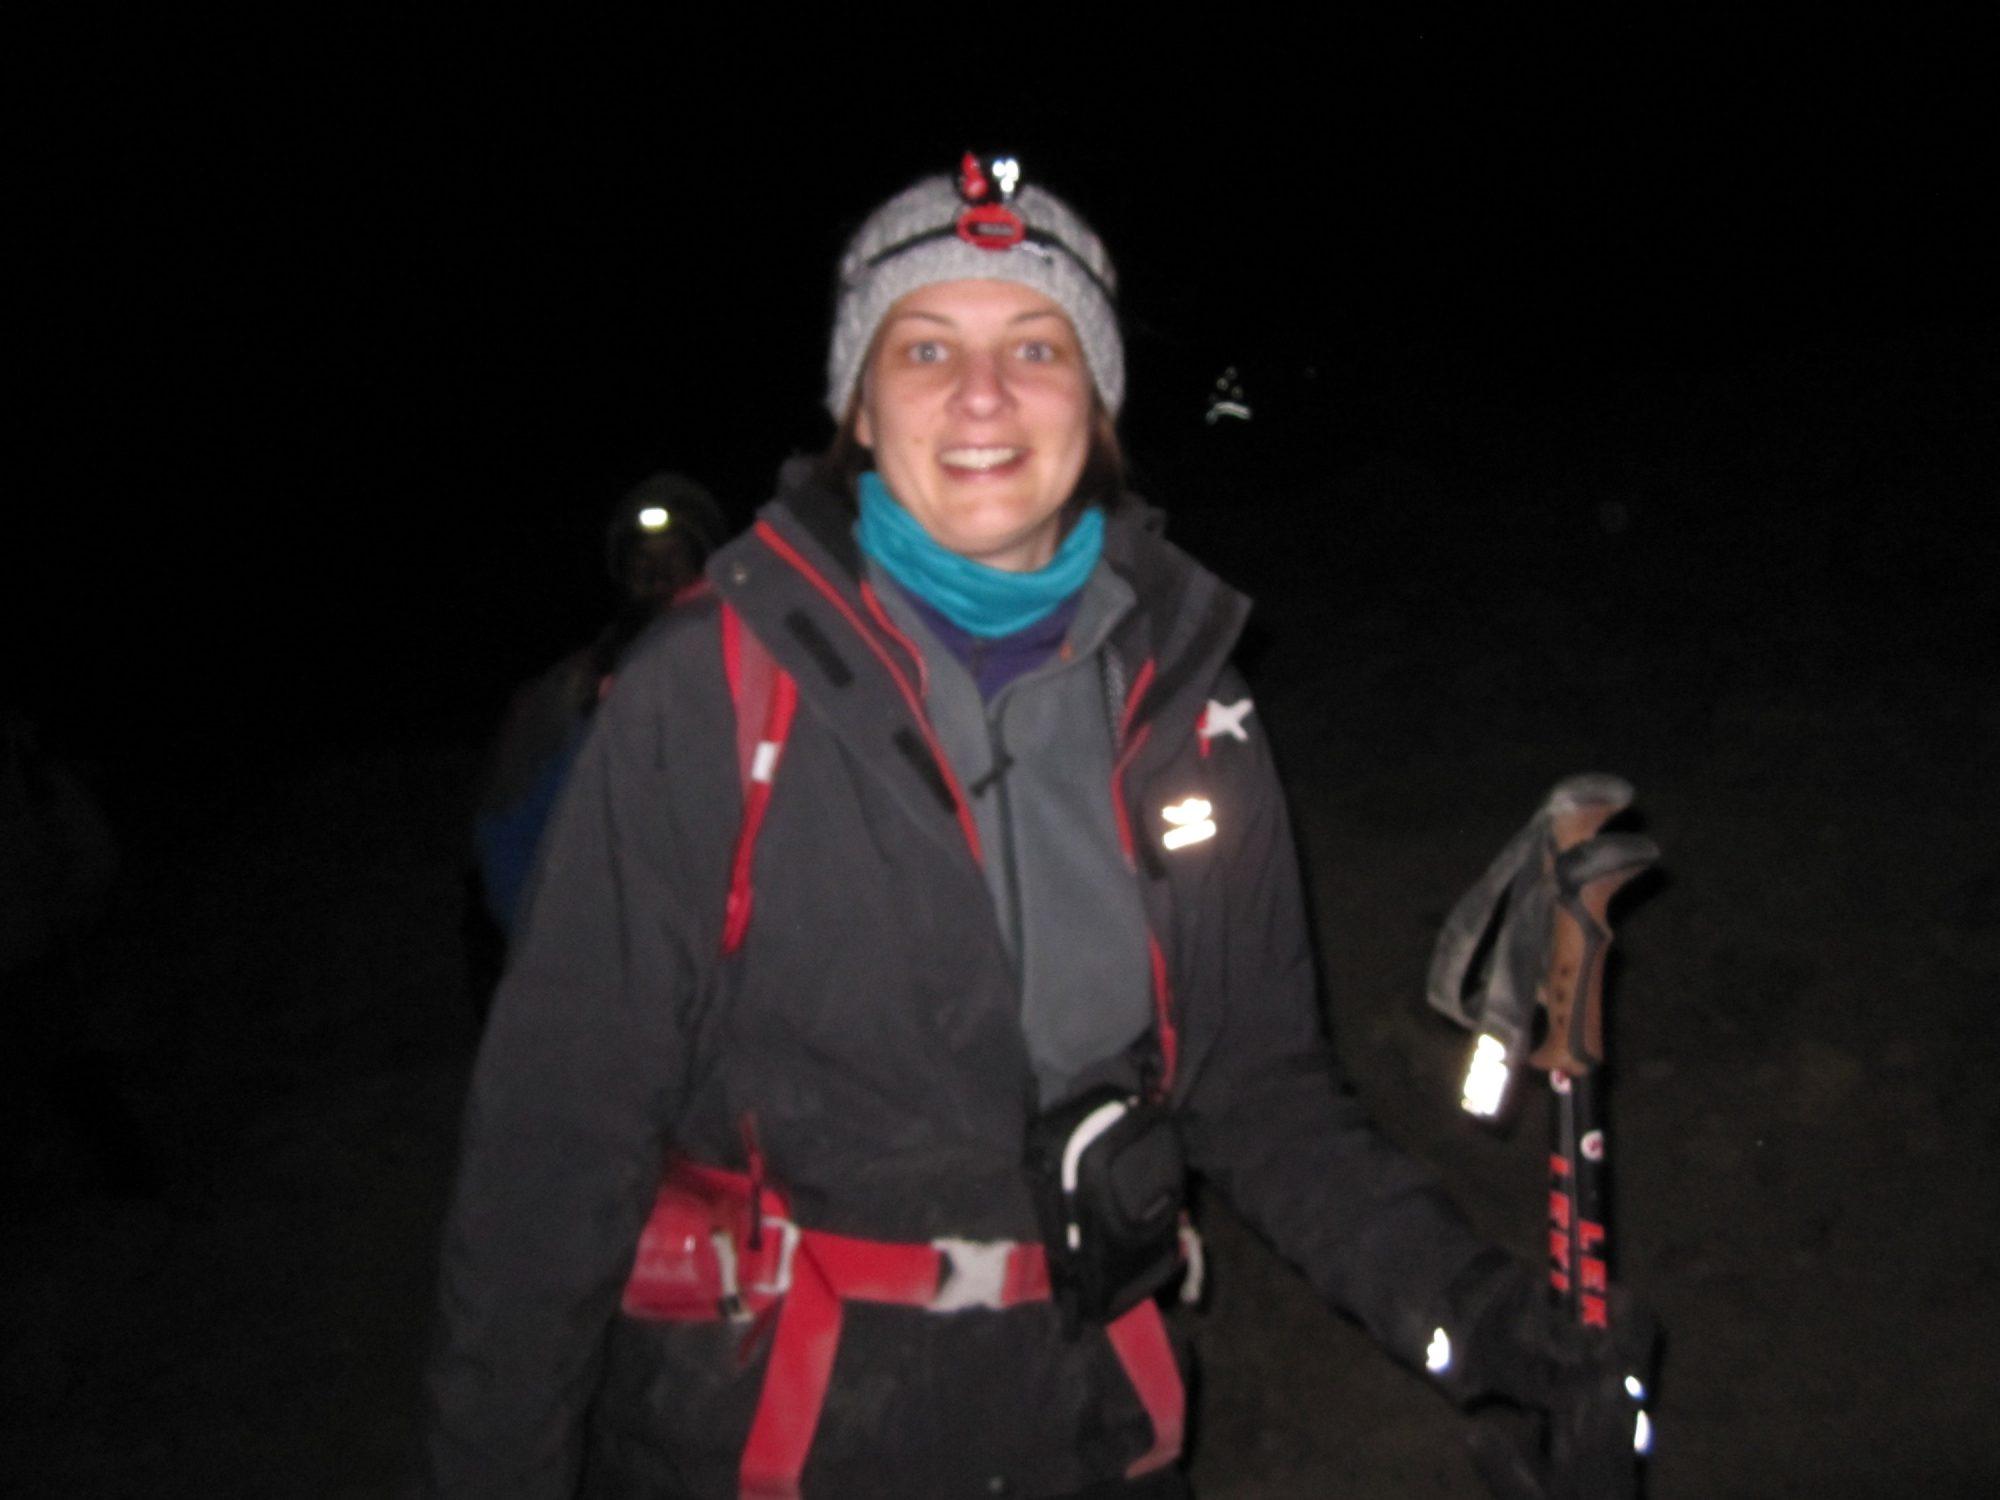 Gipfelsturm, Kilimandscharo, Kilimandscharo besteigen, Tansania, Afrika, Kilimandscharo Tour, Erfahrungsbericht, Machame Route